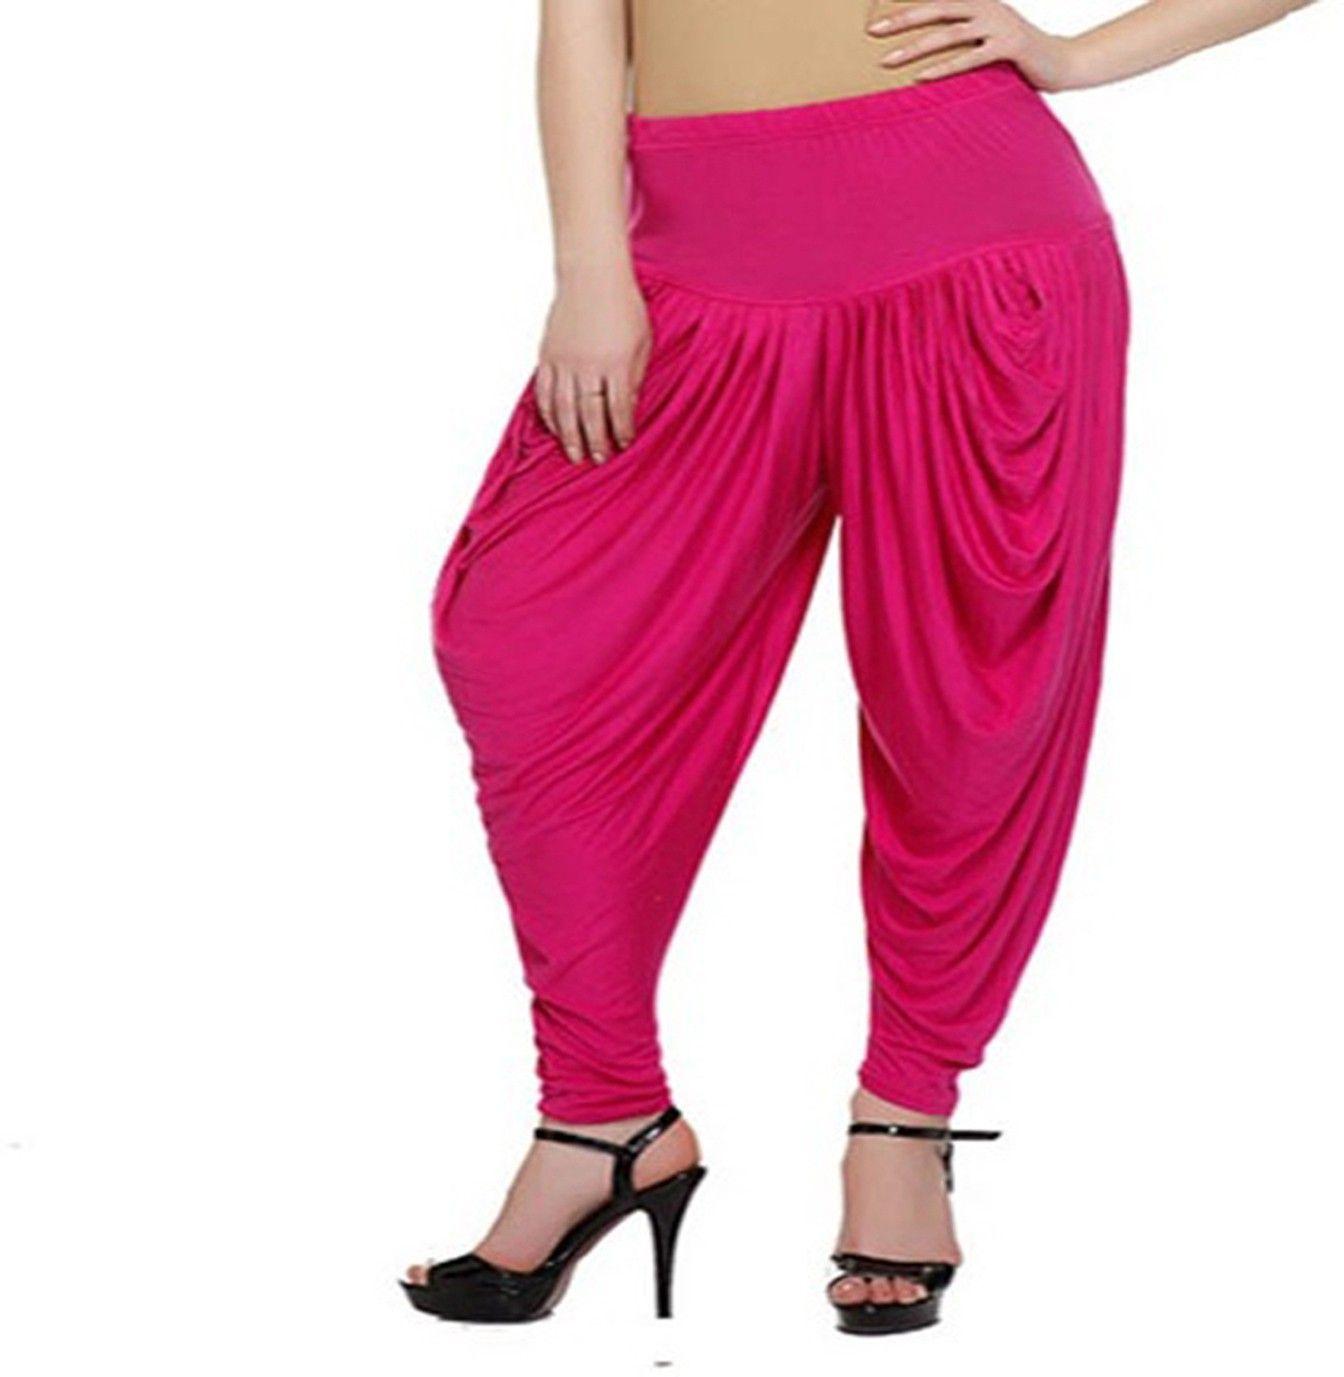 9b18b94ffc Awesome Solid Viscose, Lycra Women's Harem Pants Price: Rs. 349 Aweome  Magenta Viscose Lycra Dhoti Pants